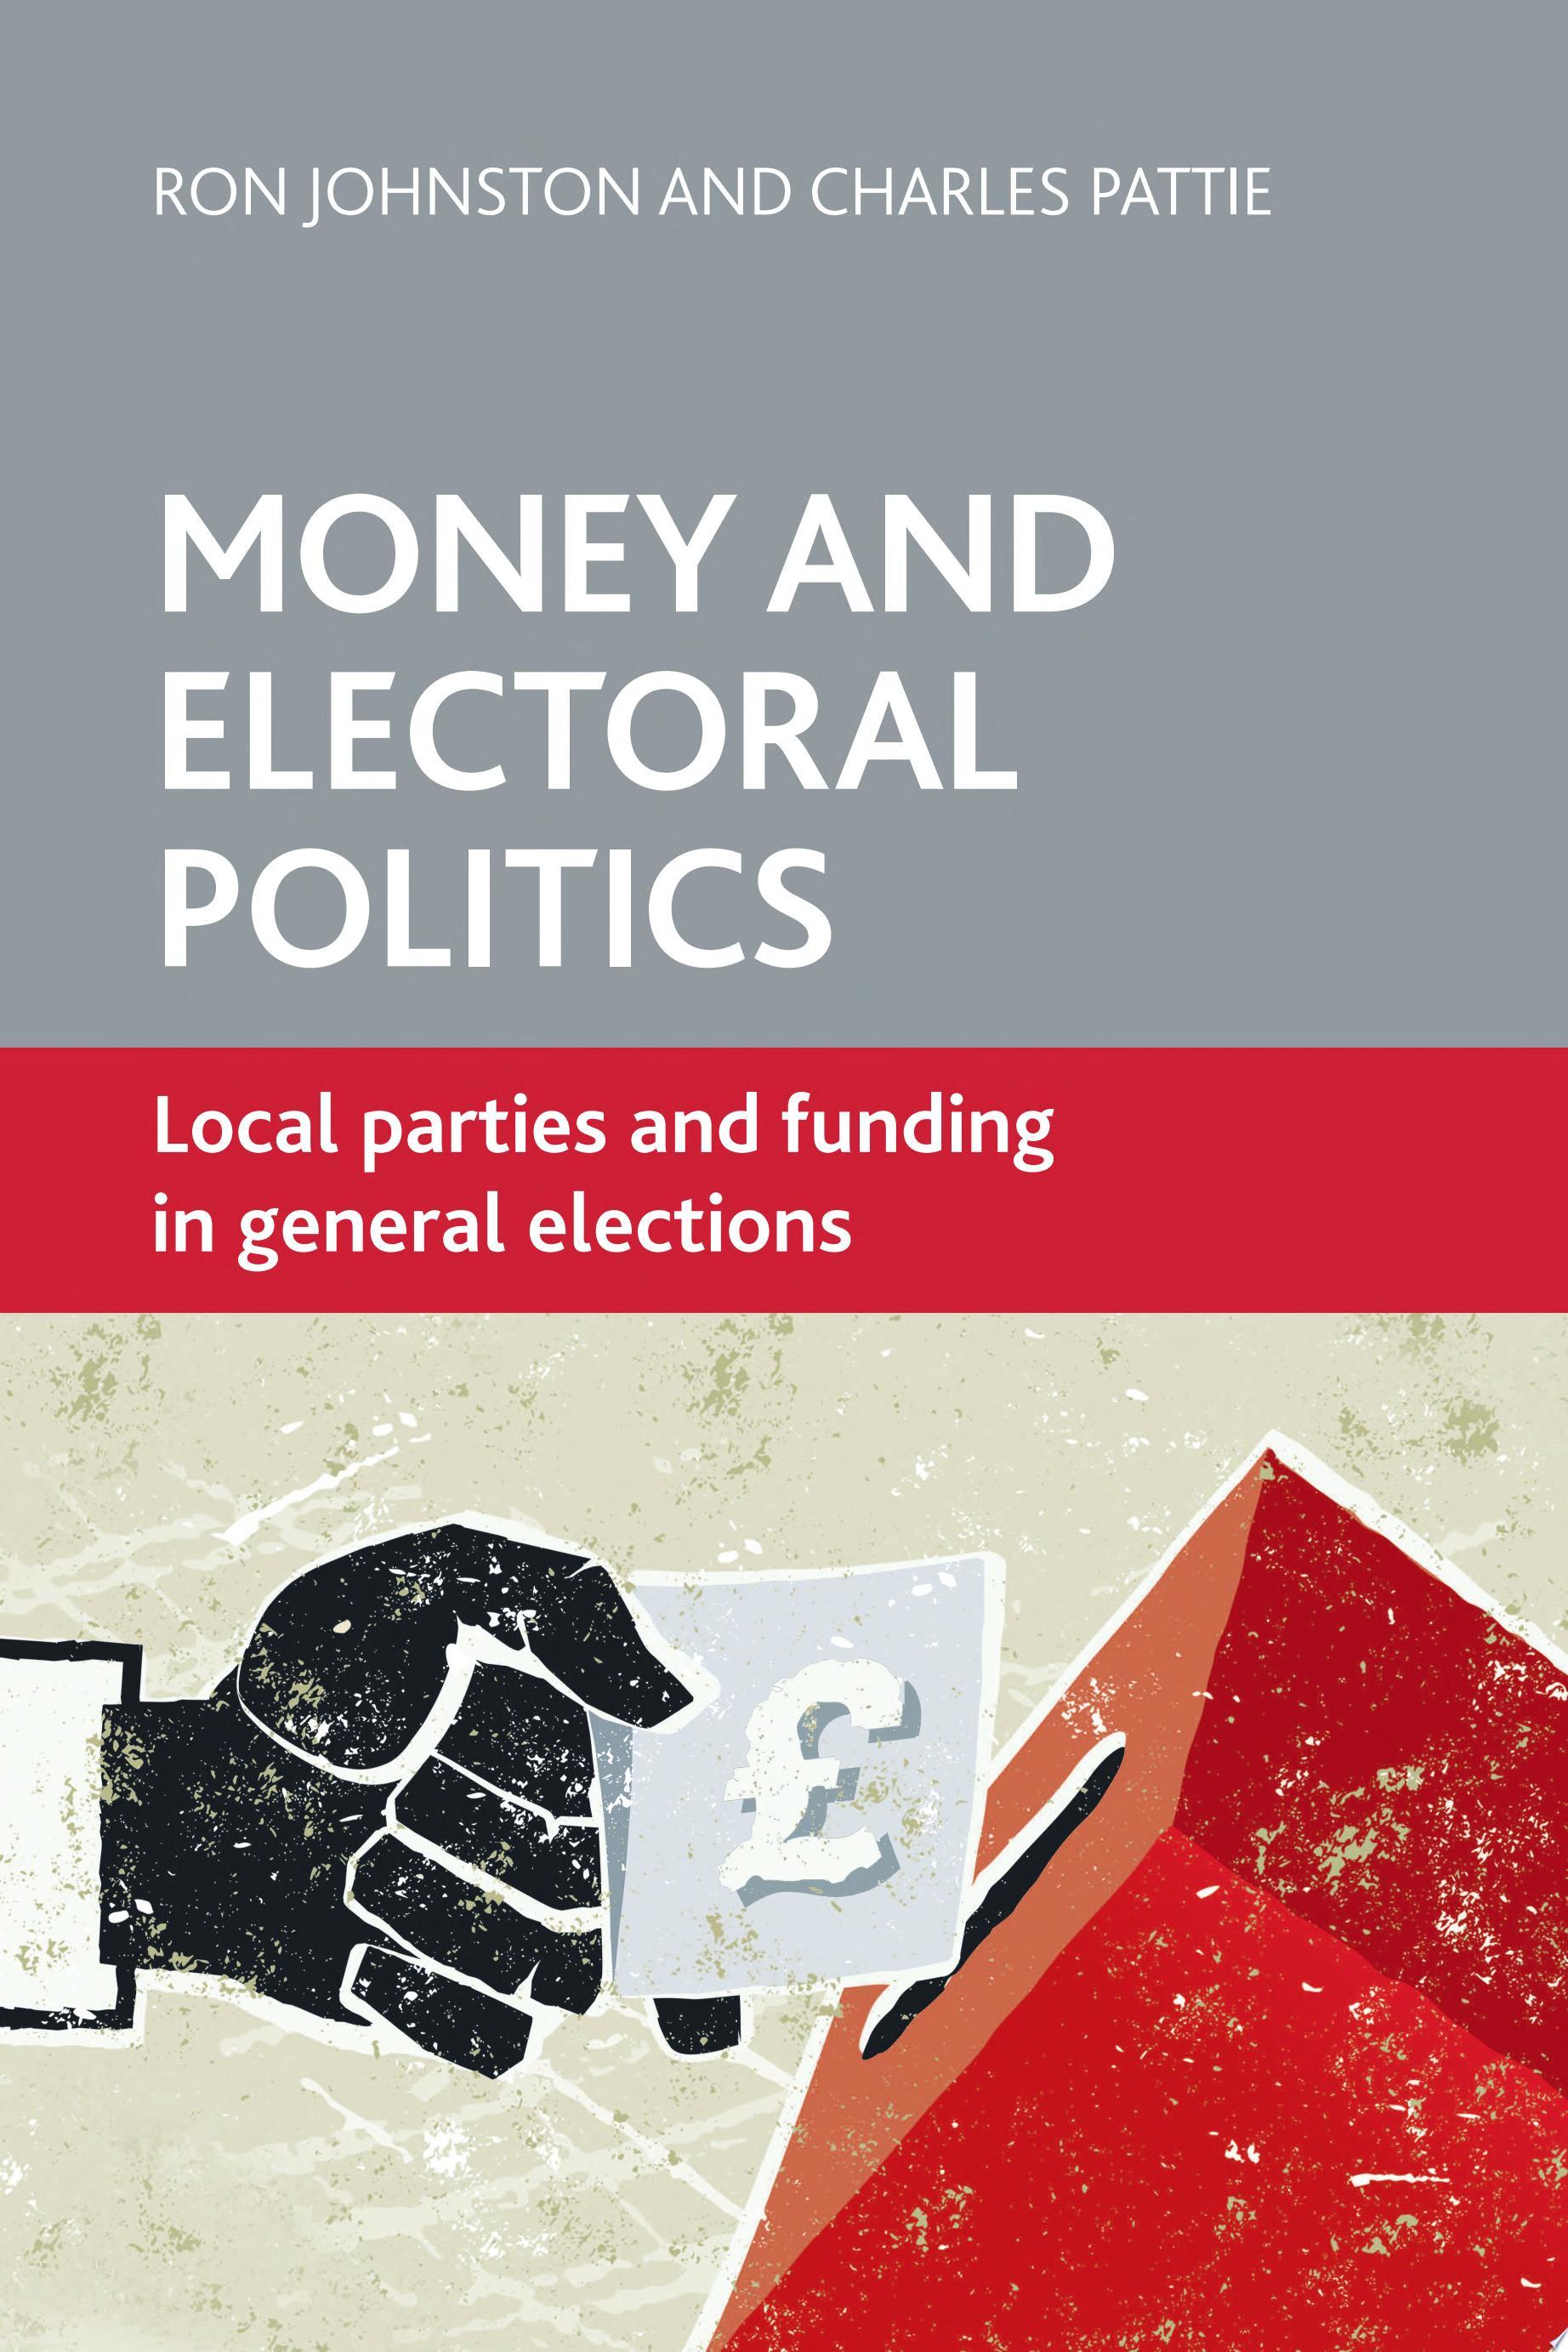 Money and electoral politics